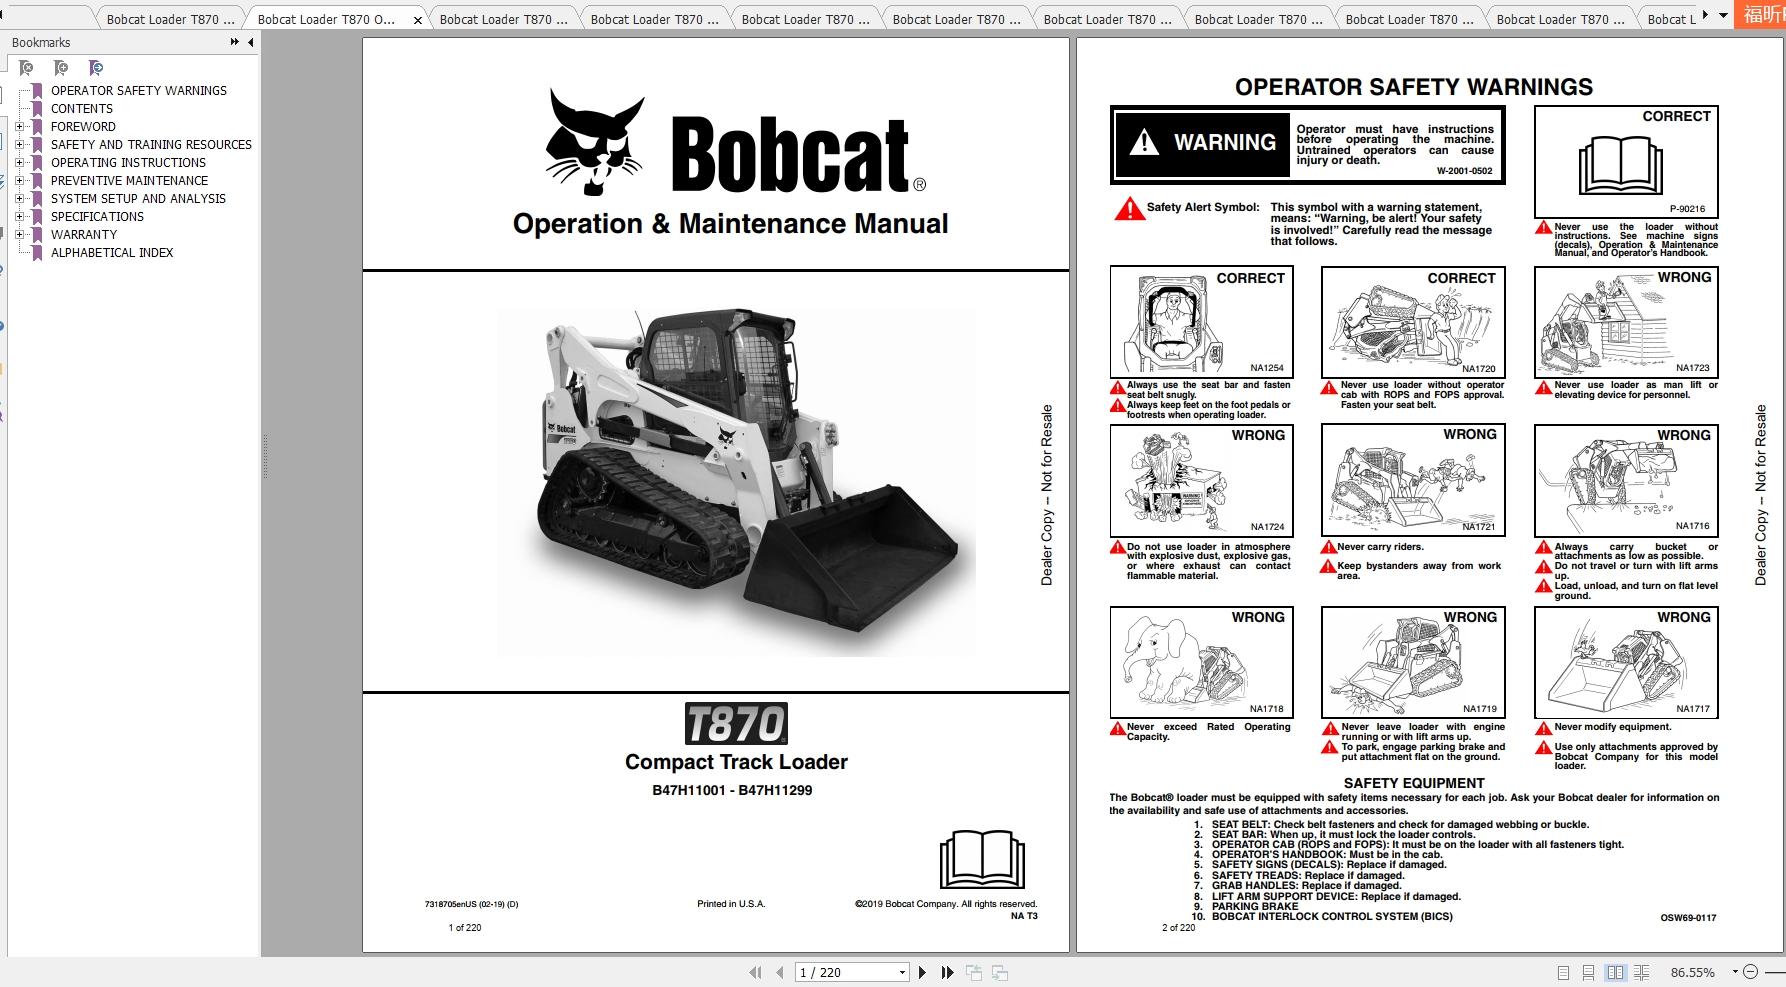 Bobcat Compact Track Loader T870 Operating & Maintenance